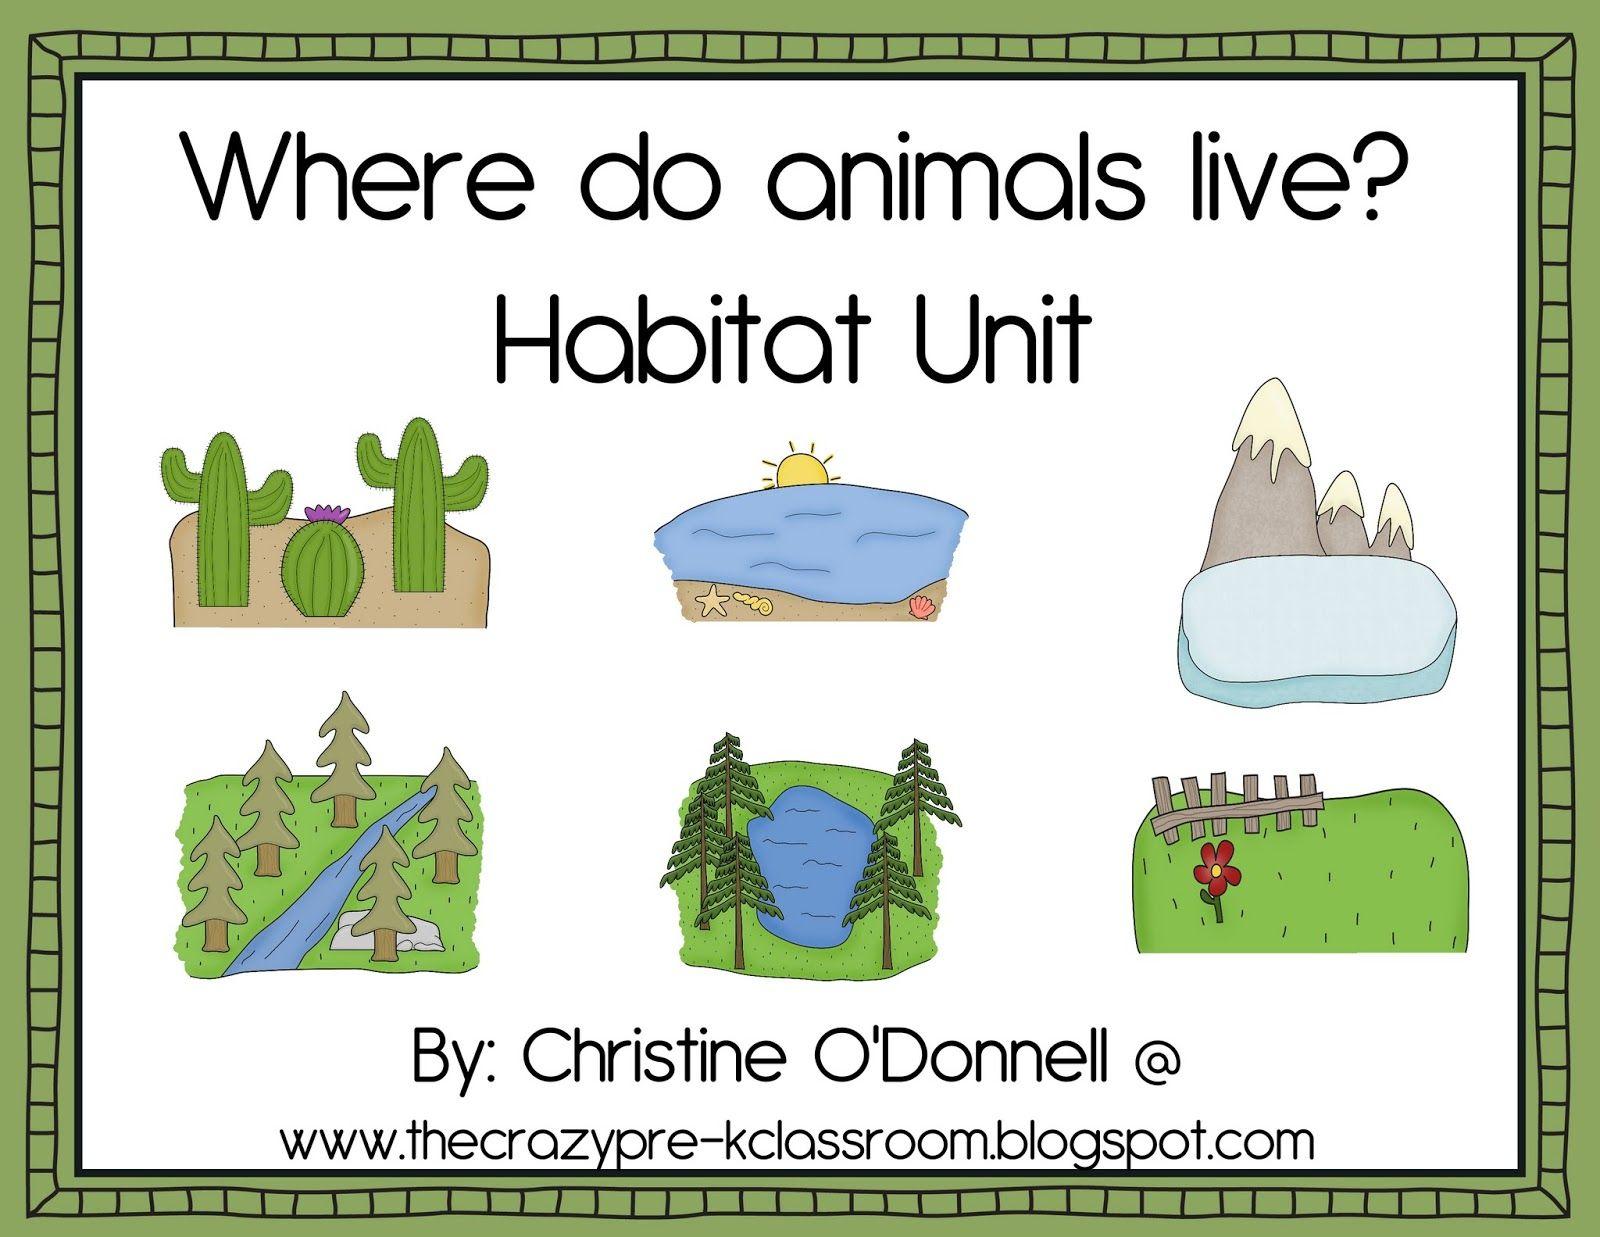 Free Worksheet Habitat Worksheets worksheet animal habitats worksheets joindesignseattle 1000 images about animals starters on pinterest vocabulary walking and animal